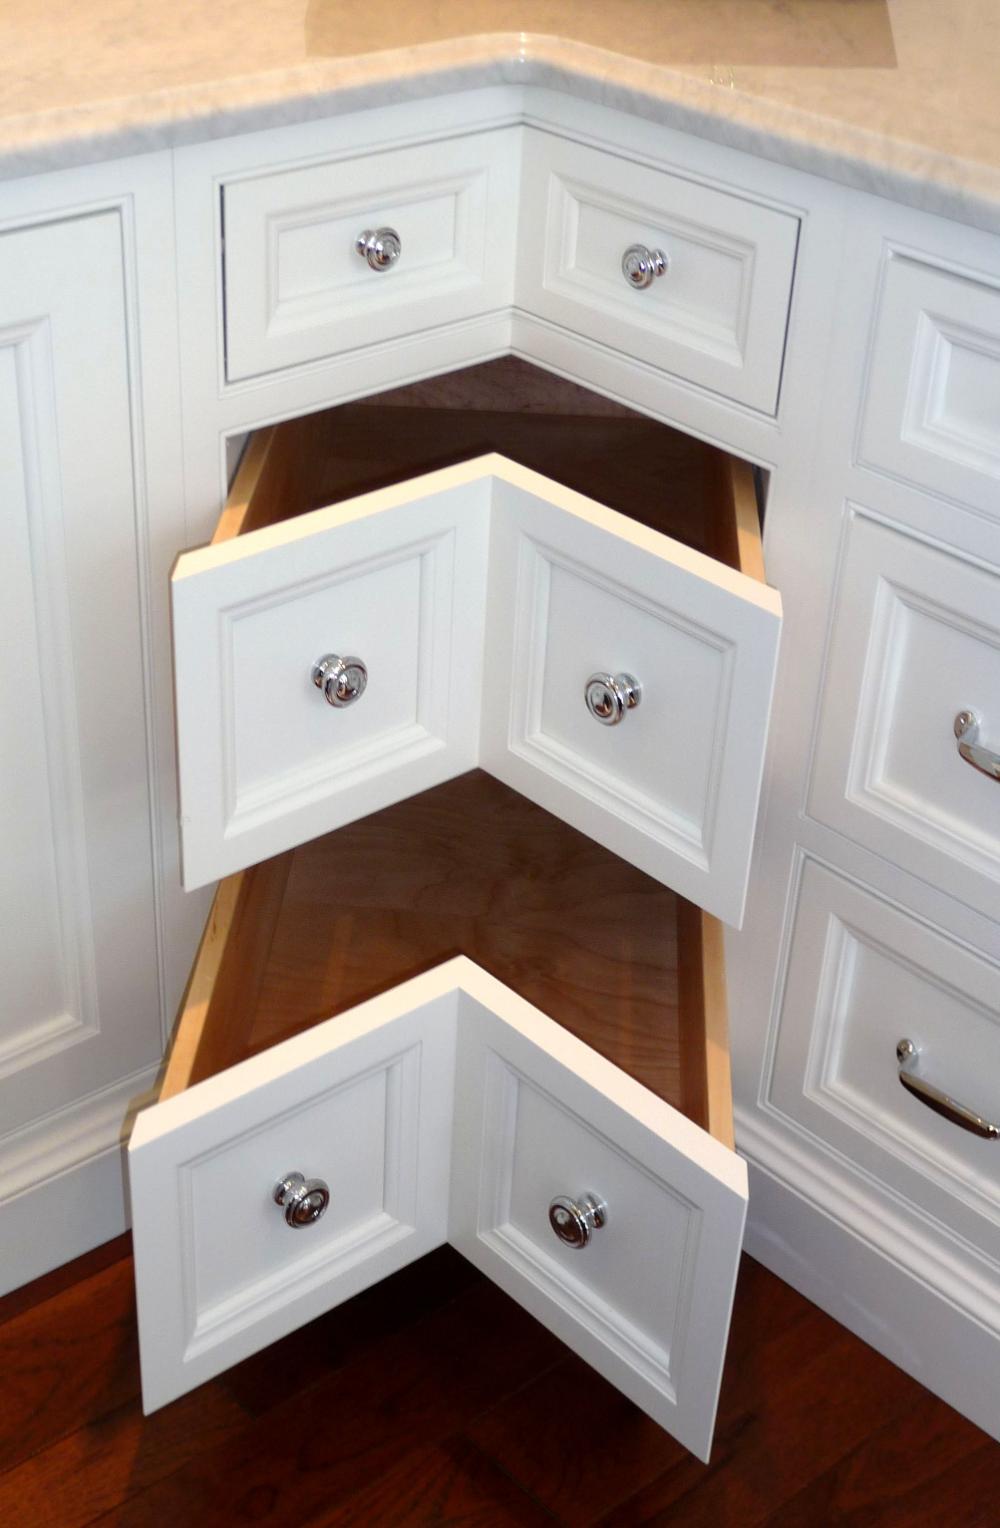 5 Lazy Susan Alternatives In 2020 Corner Kitchen Cabinet Corner Drawers Kitchen Remodel Design